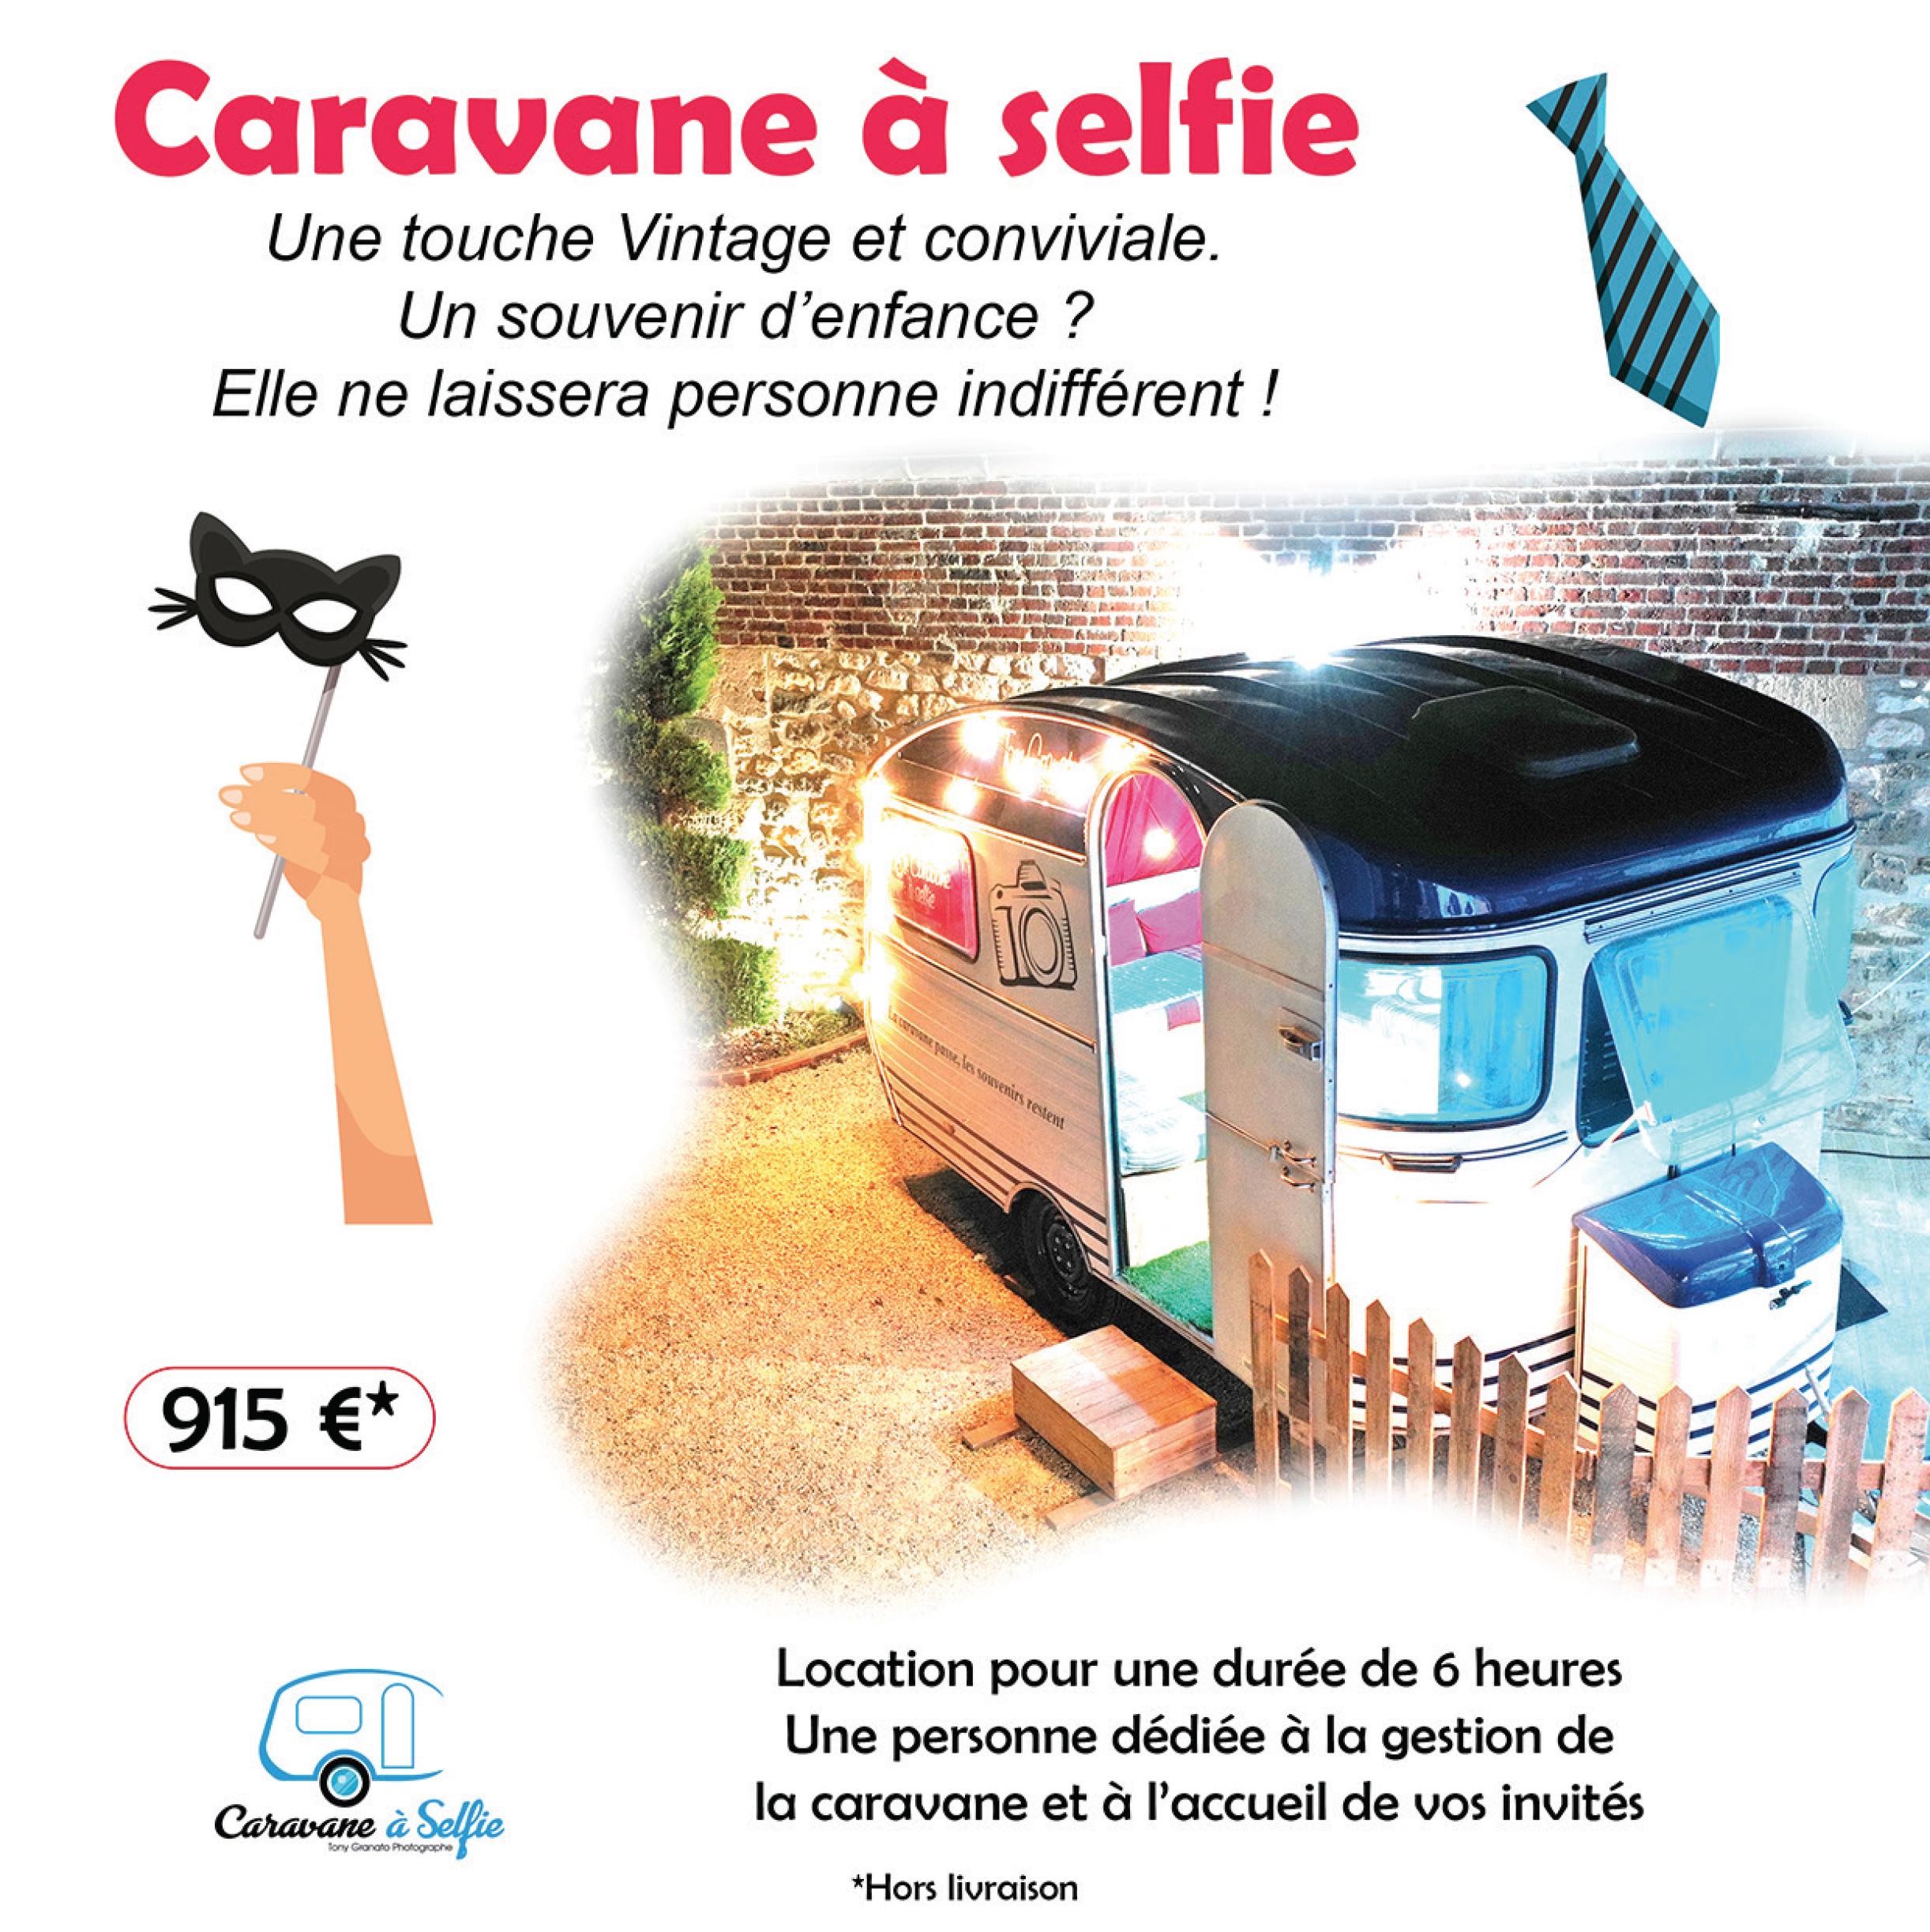 caravane-a-selfie